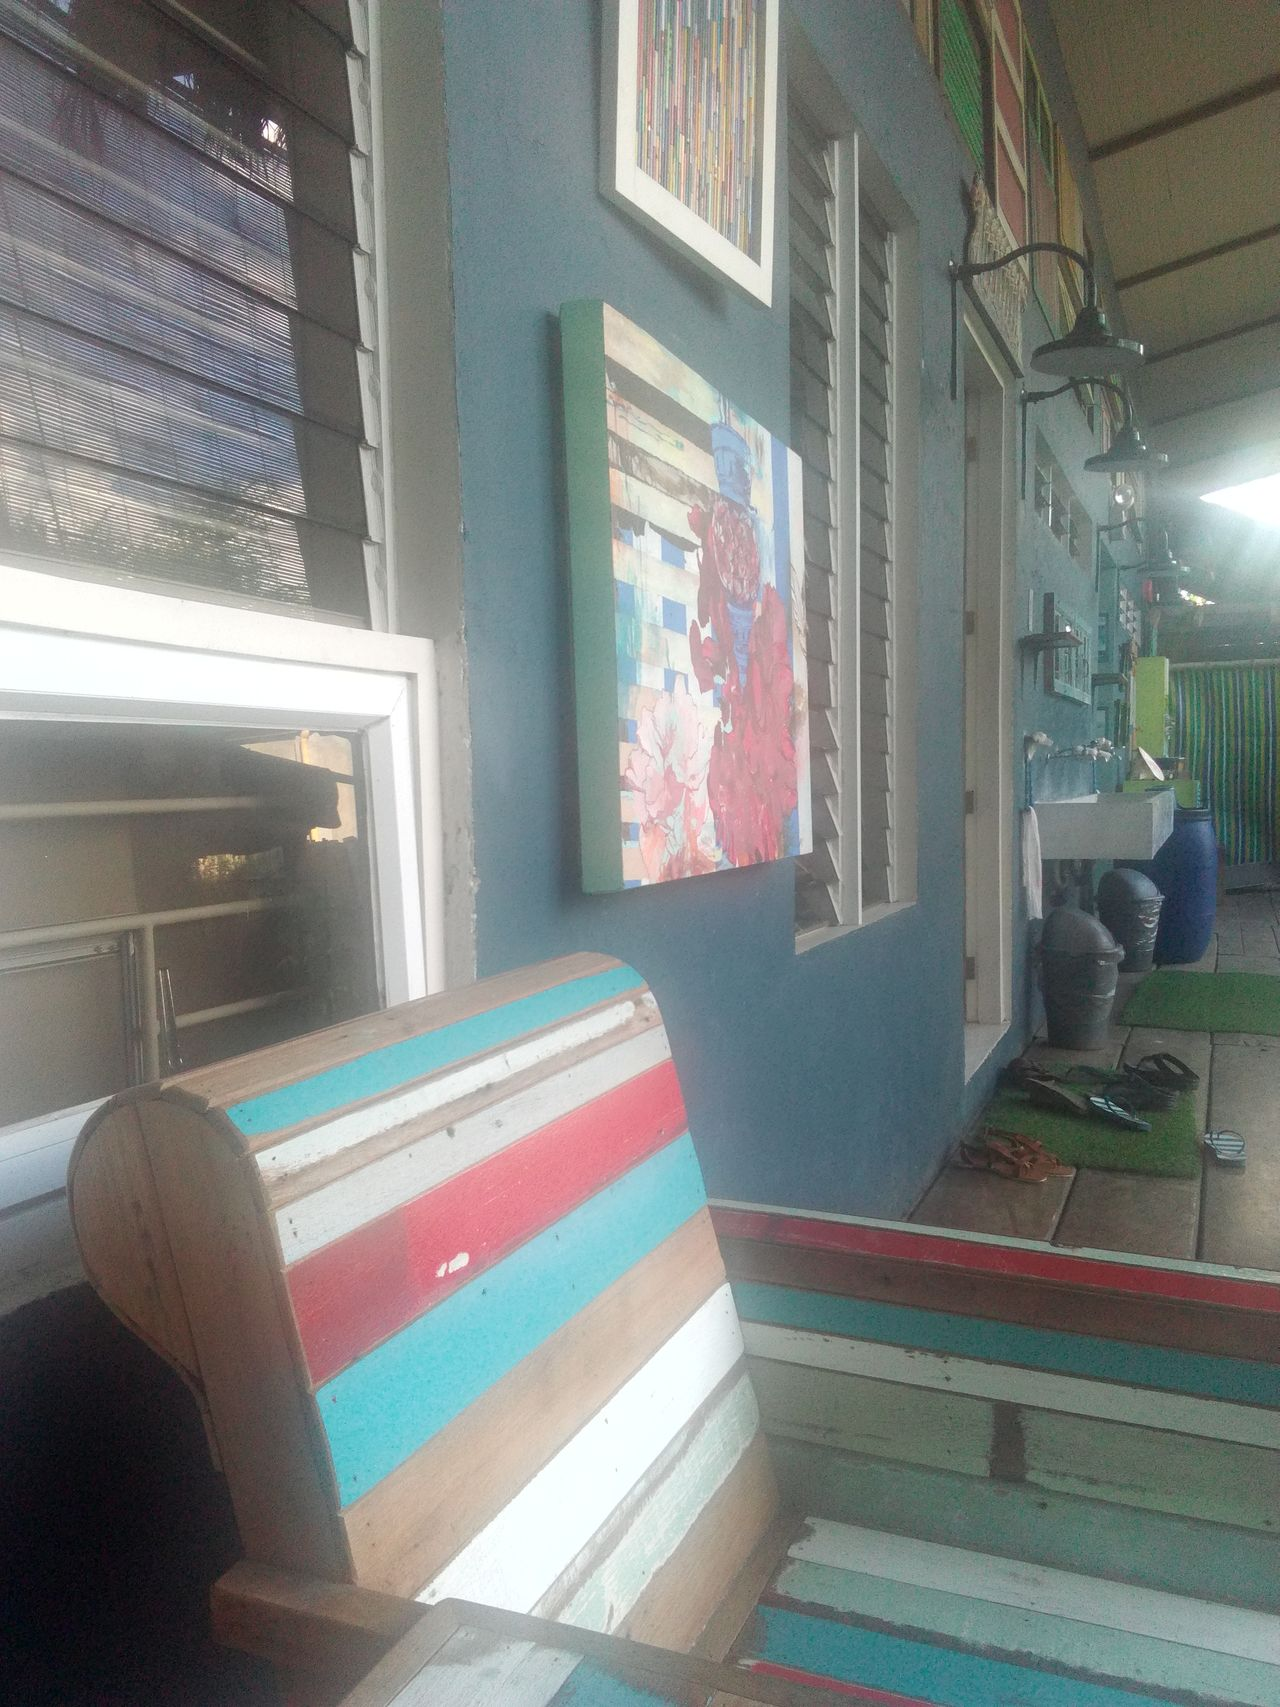 Exploring Style Chillvibes✌ Multi Colored Architecture Window Sunlight